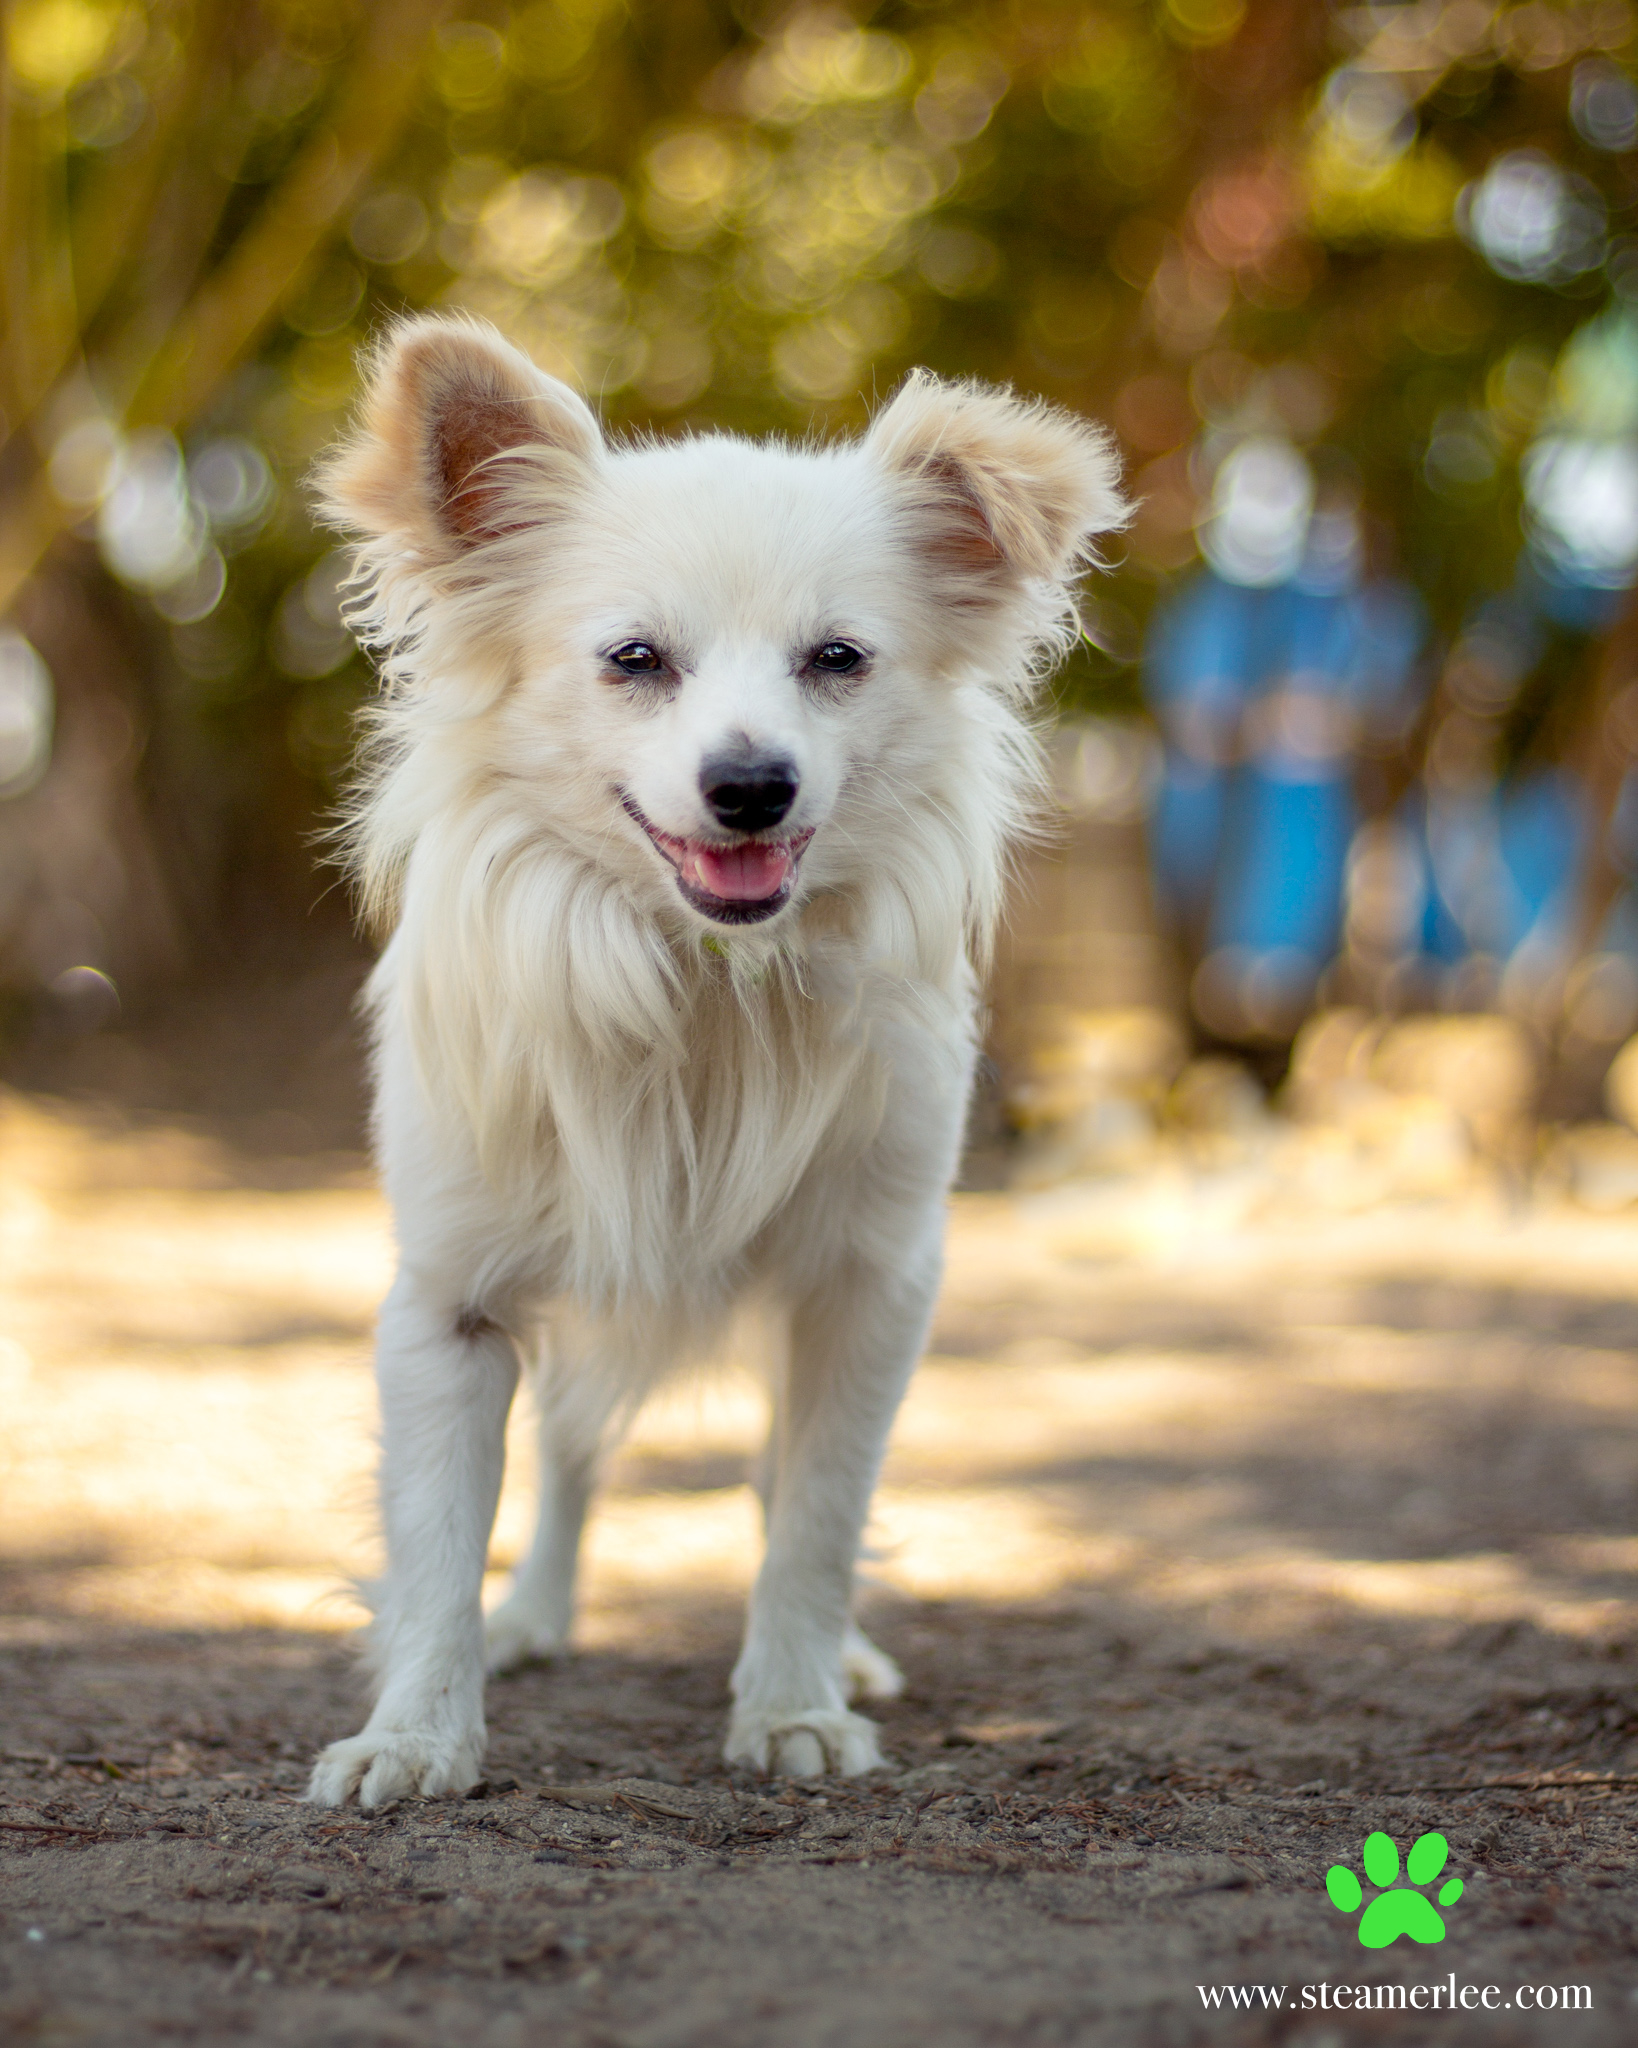 483-Orange-County-Dog-Photography-Steamer-Lee-Southern-California-SBACC.JPG